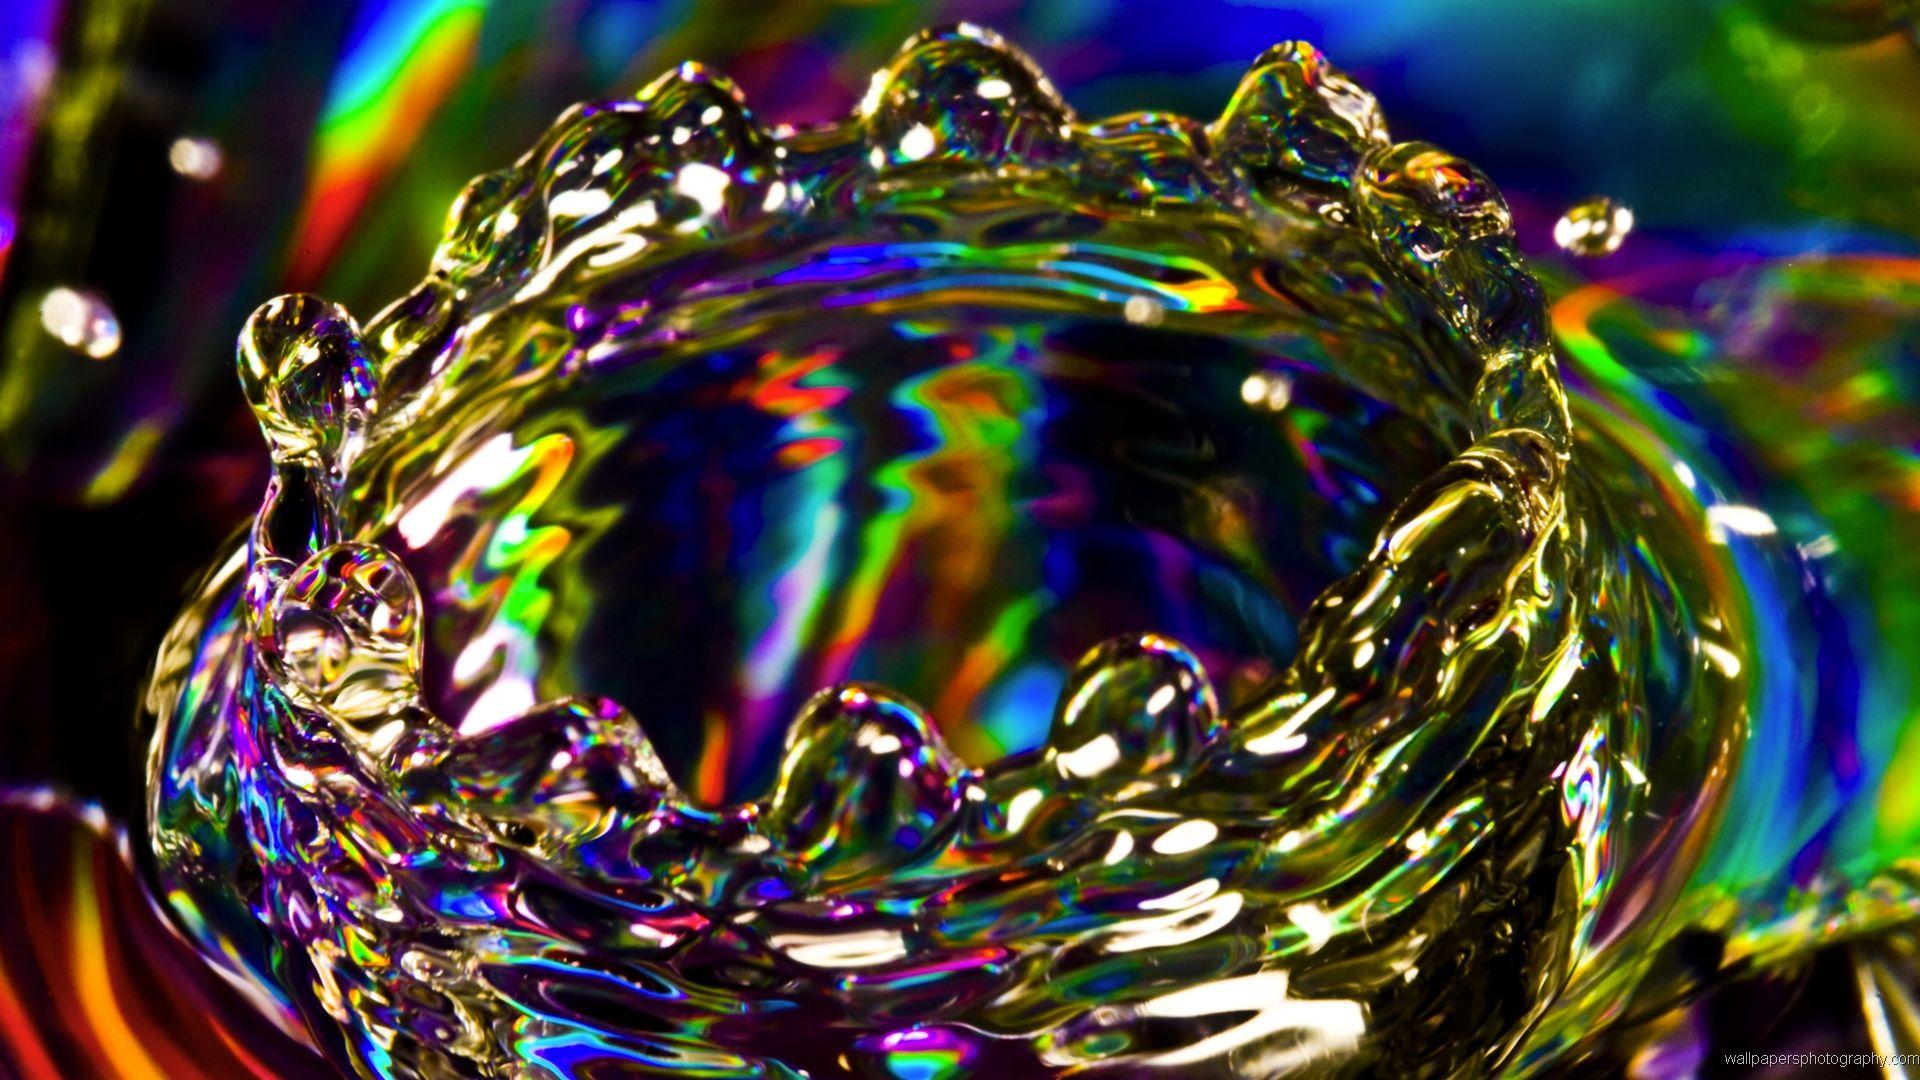 colourful hd 1080p wallpaper - photo #17